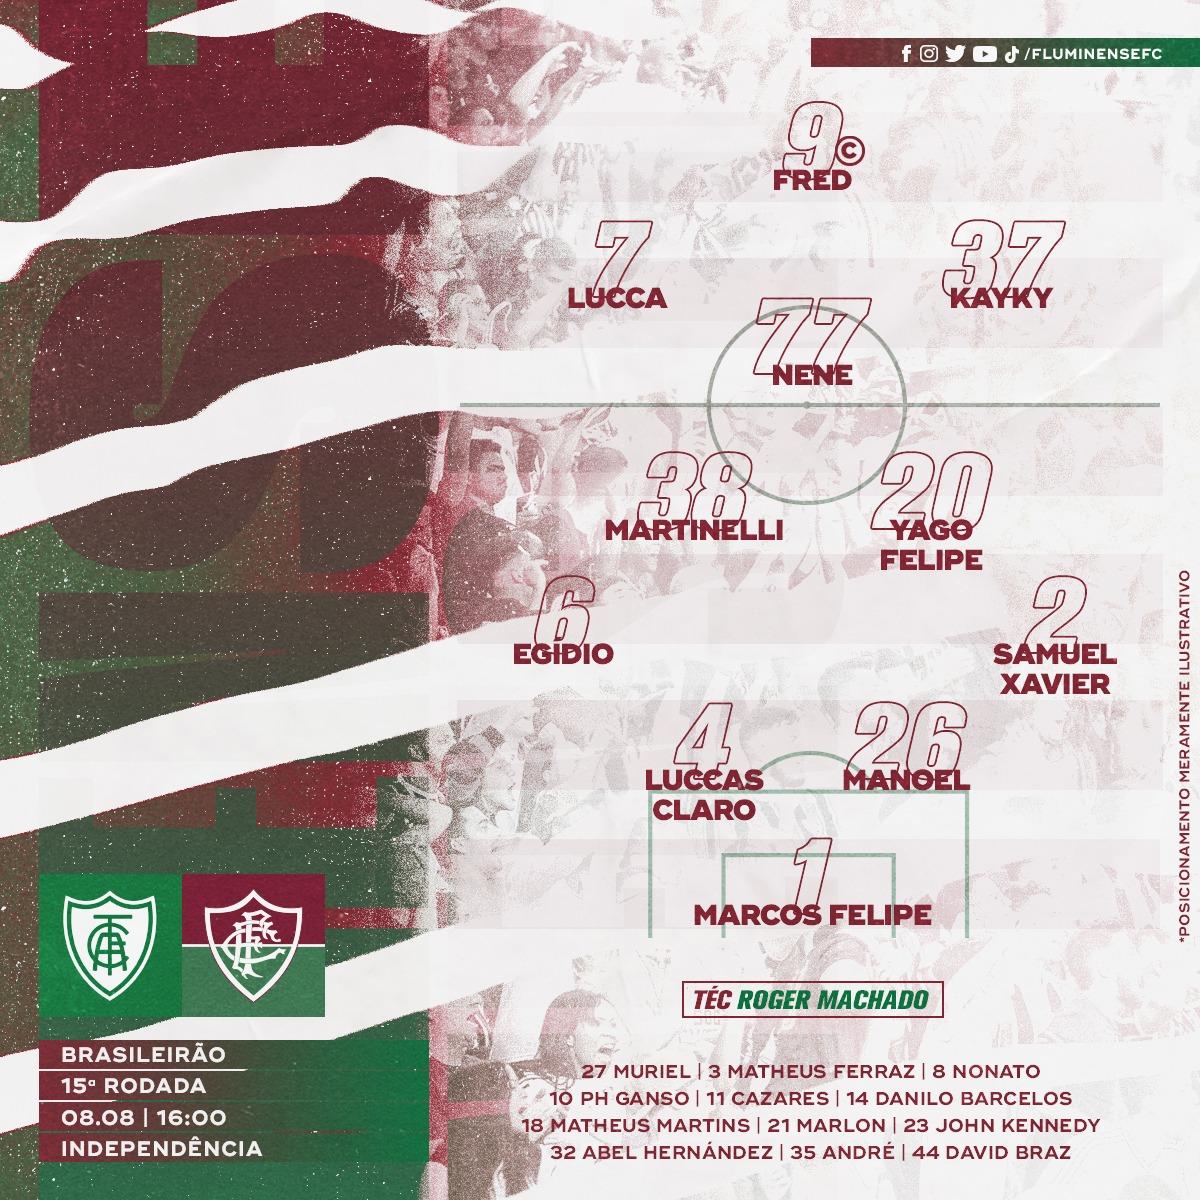 Fluminense escalado para pegar o América-MG pela Série A do Campeonato Brasileiro